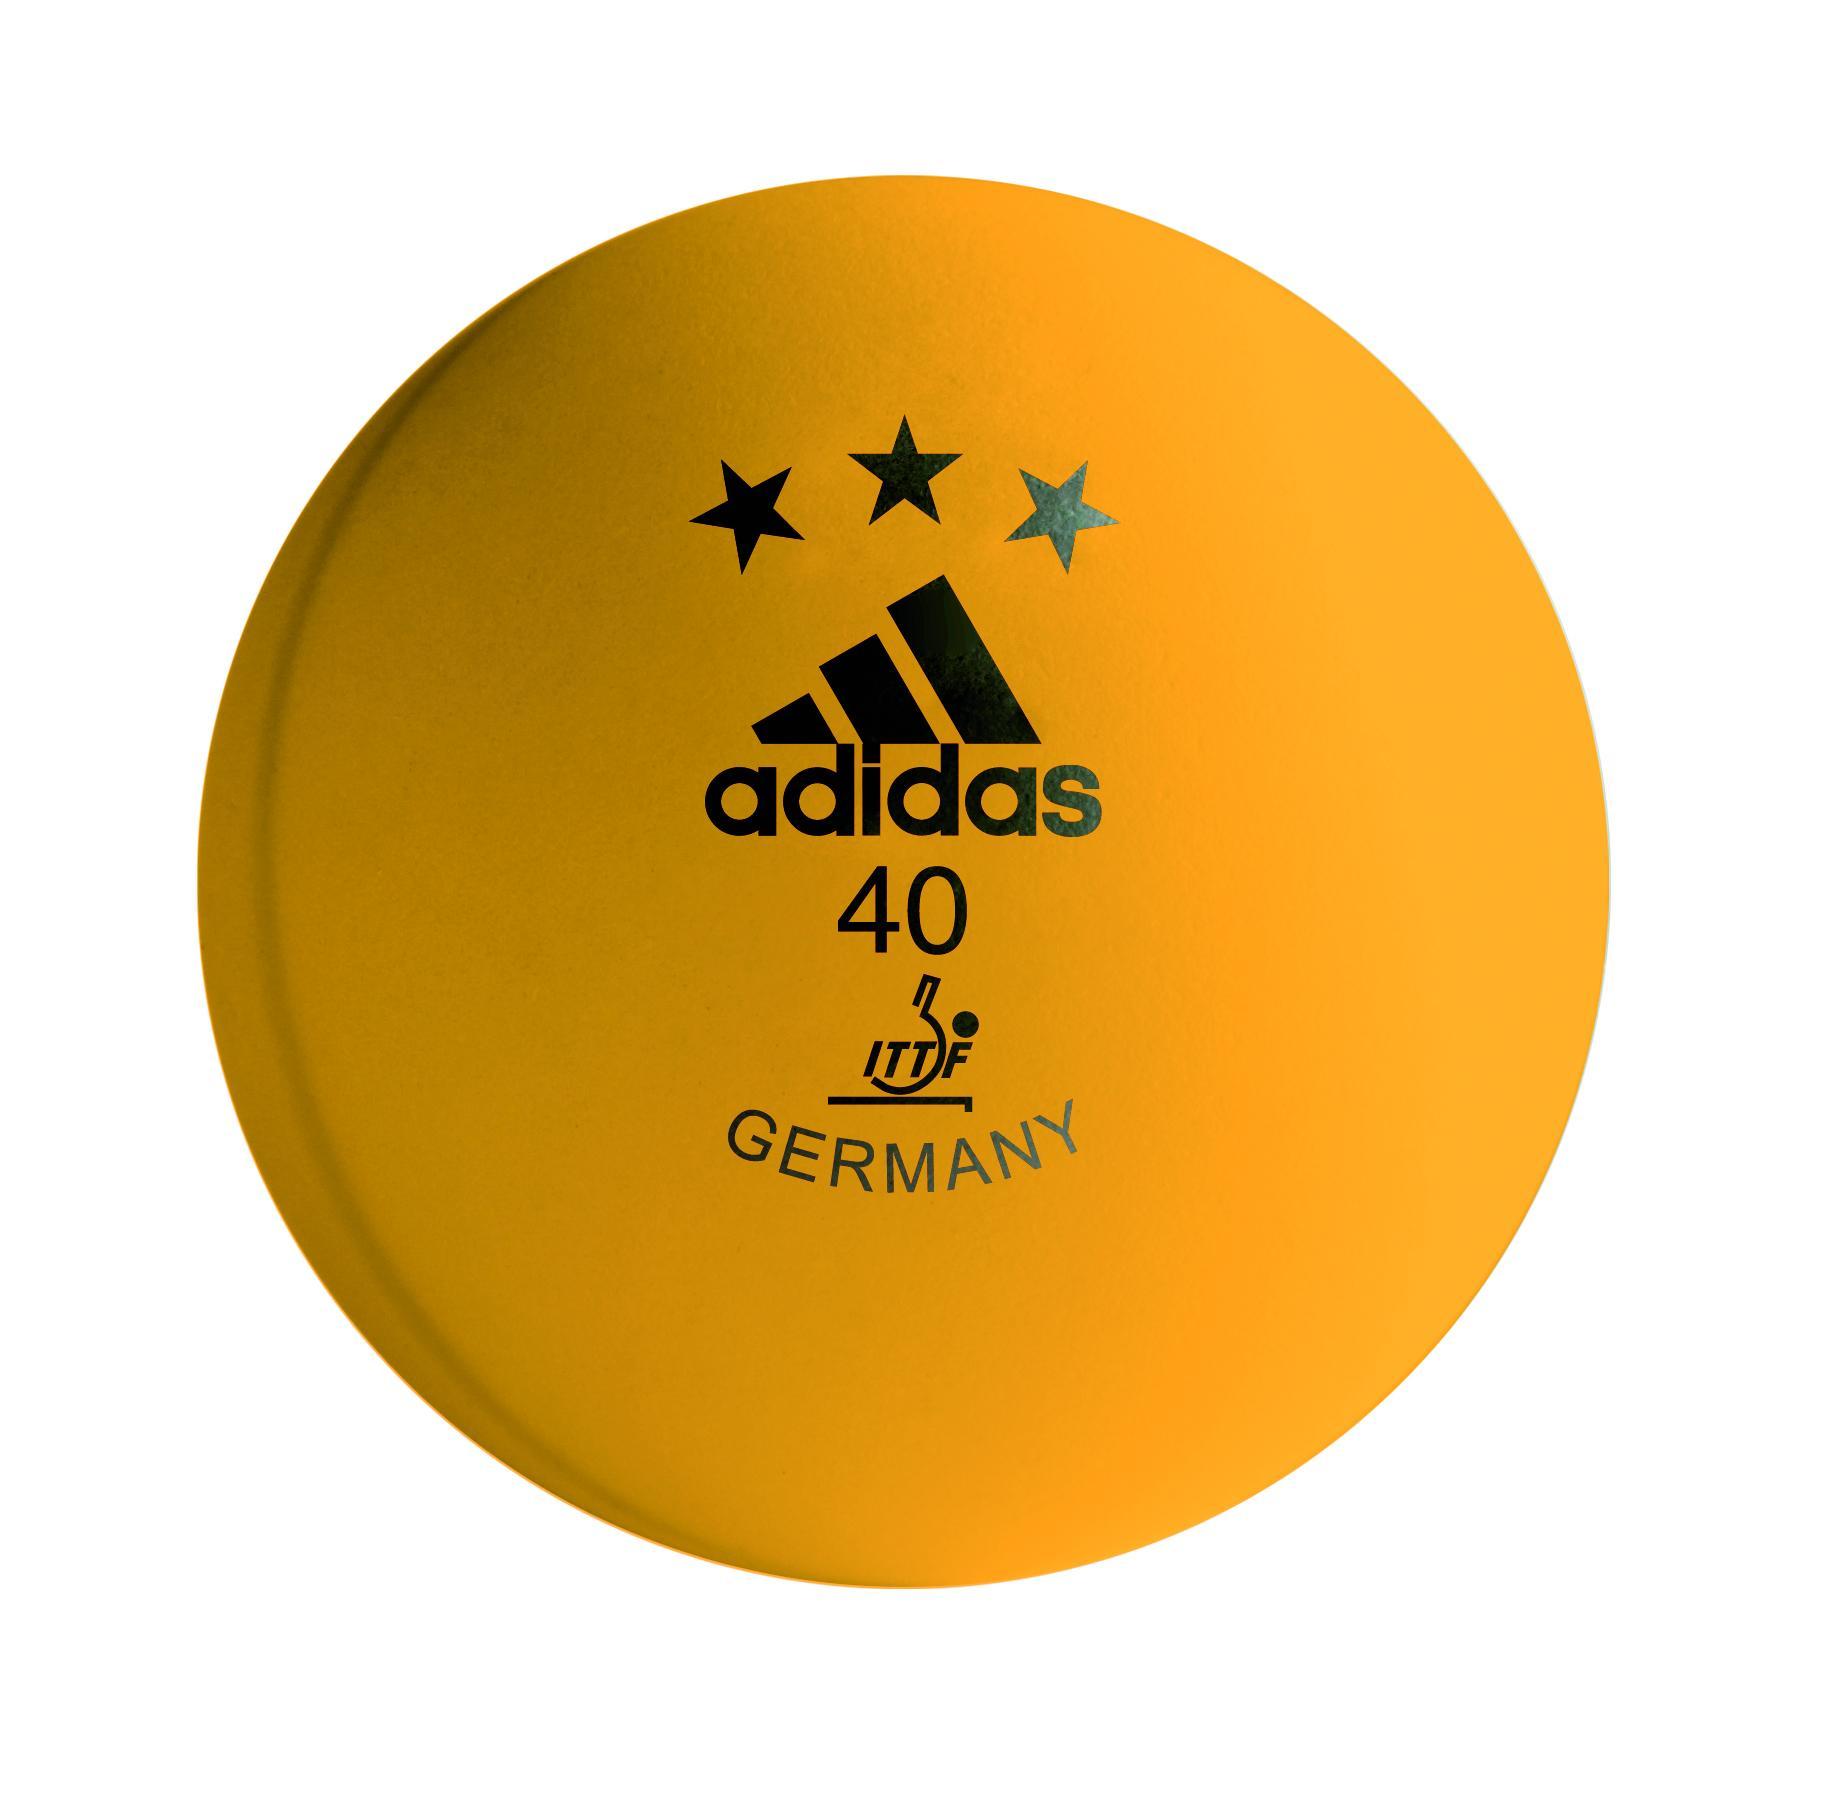 Table tennis balls